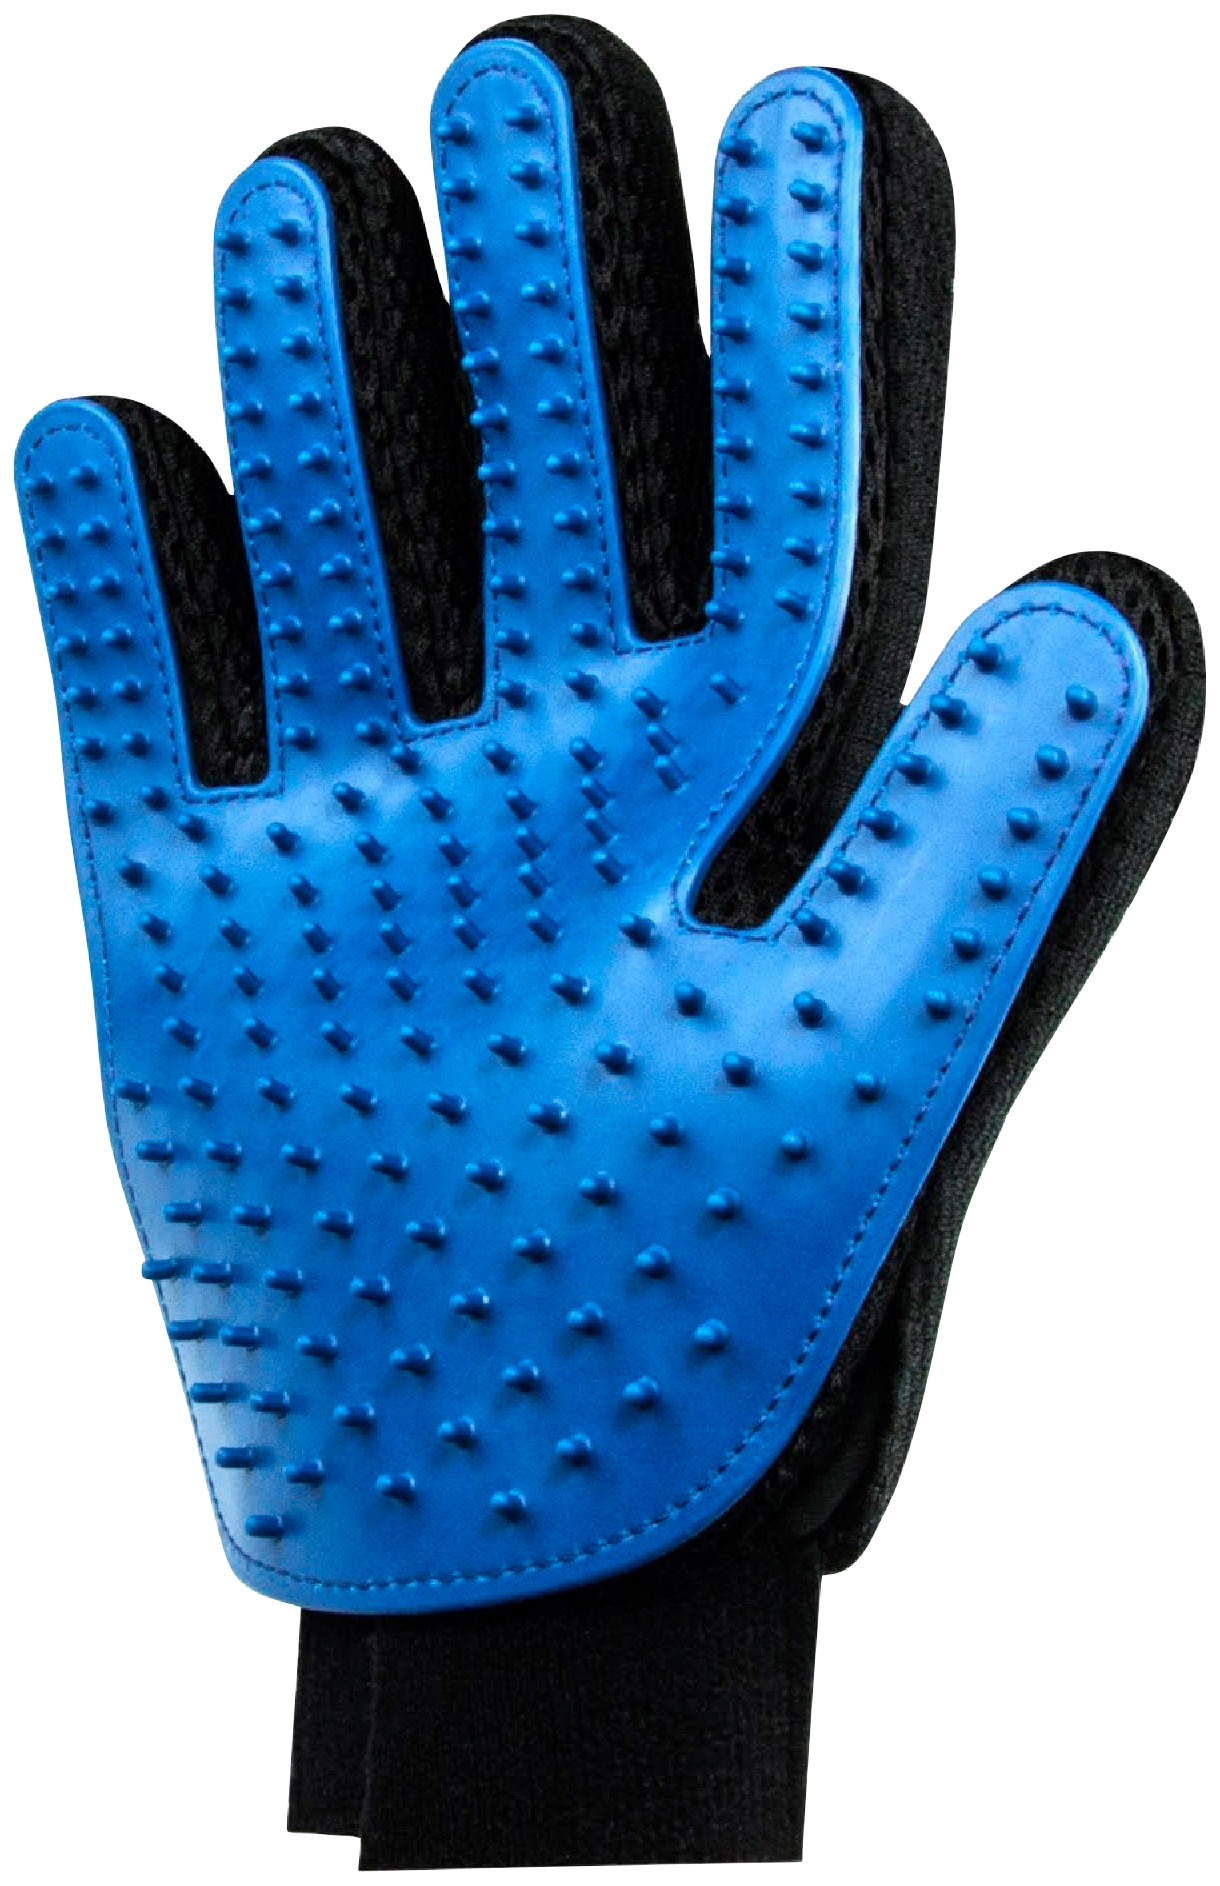 HEIM Fellpflegehandschuh, Gummi, 2 Stk. blau Hundepflege Hund Tierbedarf Fellpflegehandschuh